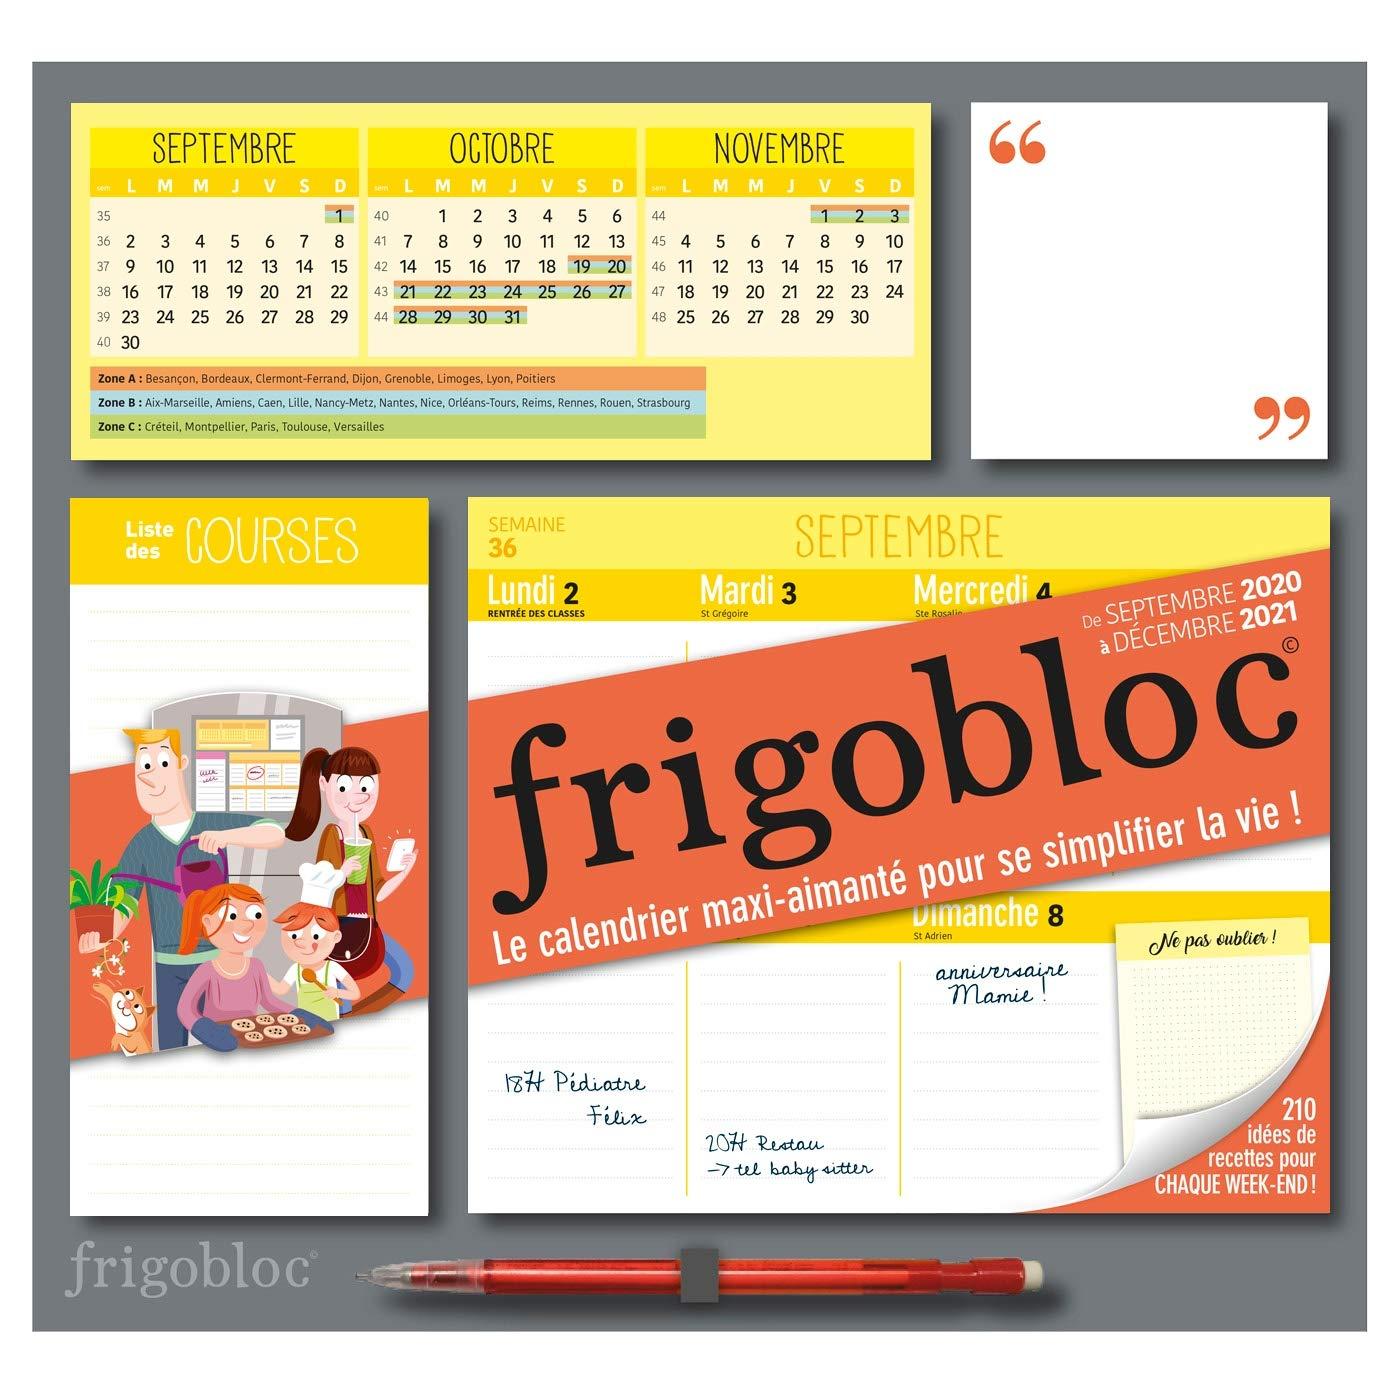 Frigobloc 2021 Hebdomadaire   Calendrier d'organisation familiale